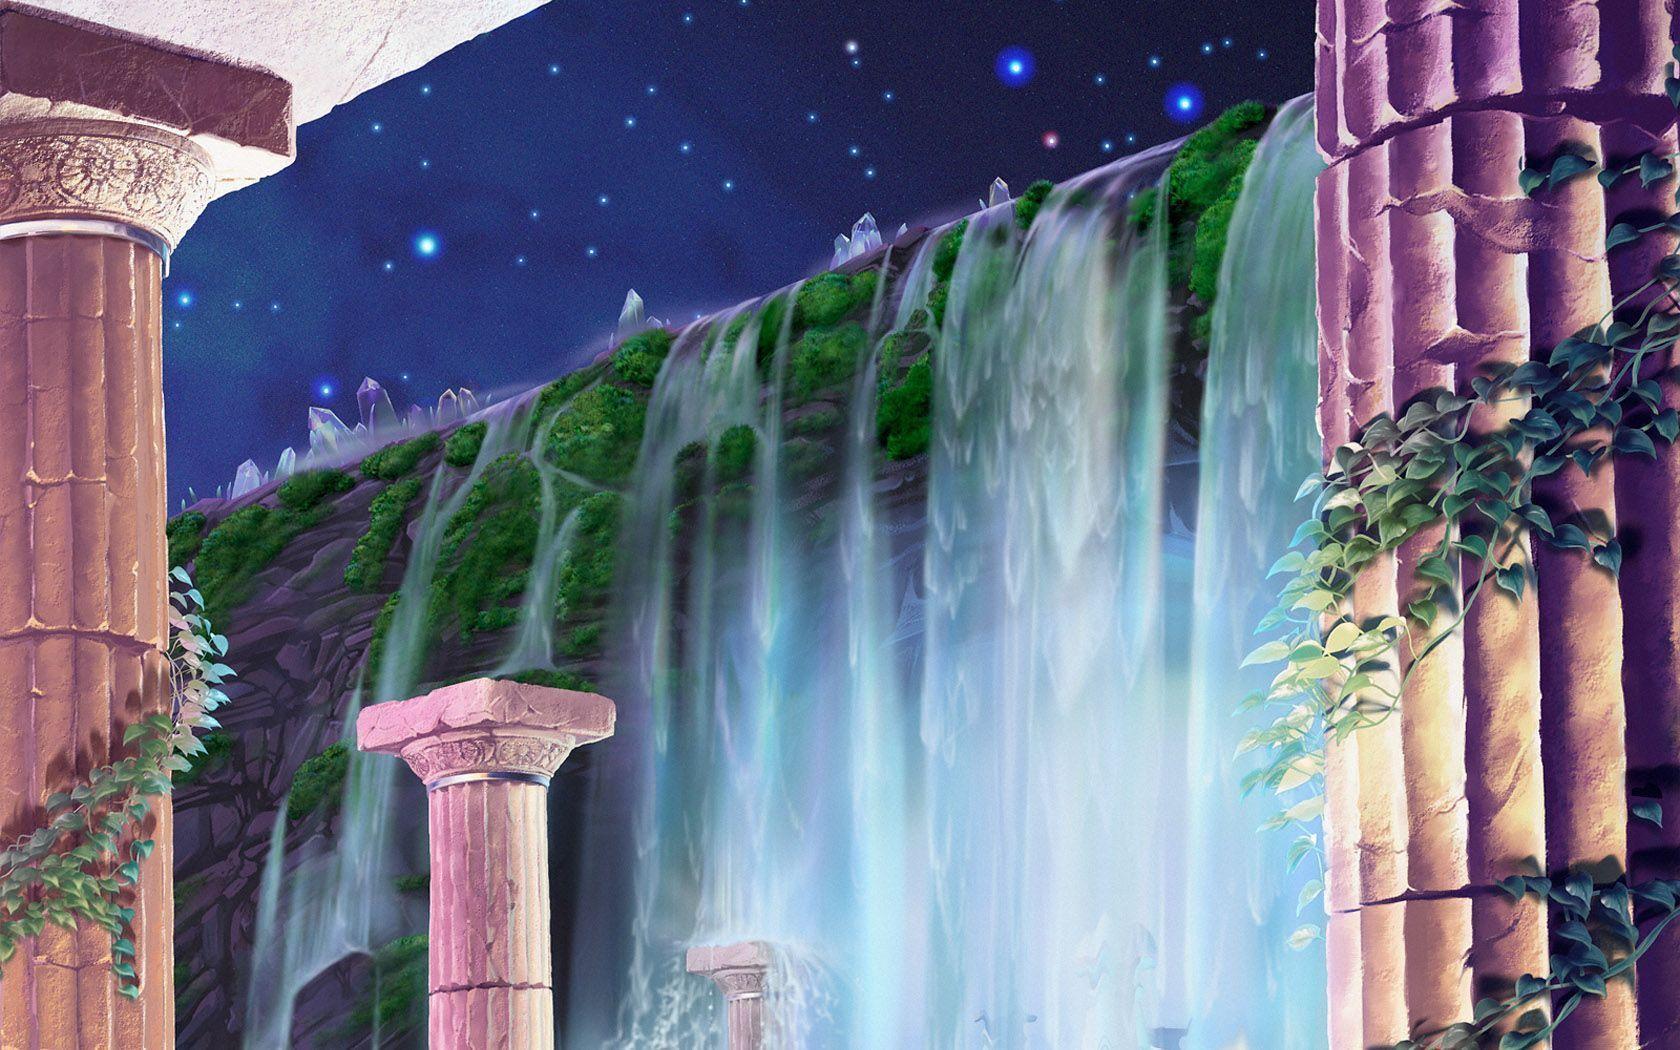 KAGAYA - Celestial Exploring - YouTube